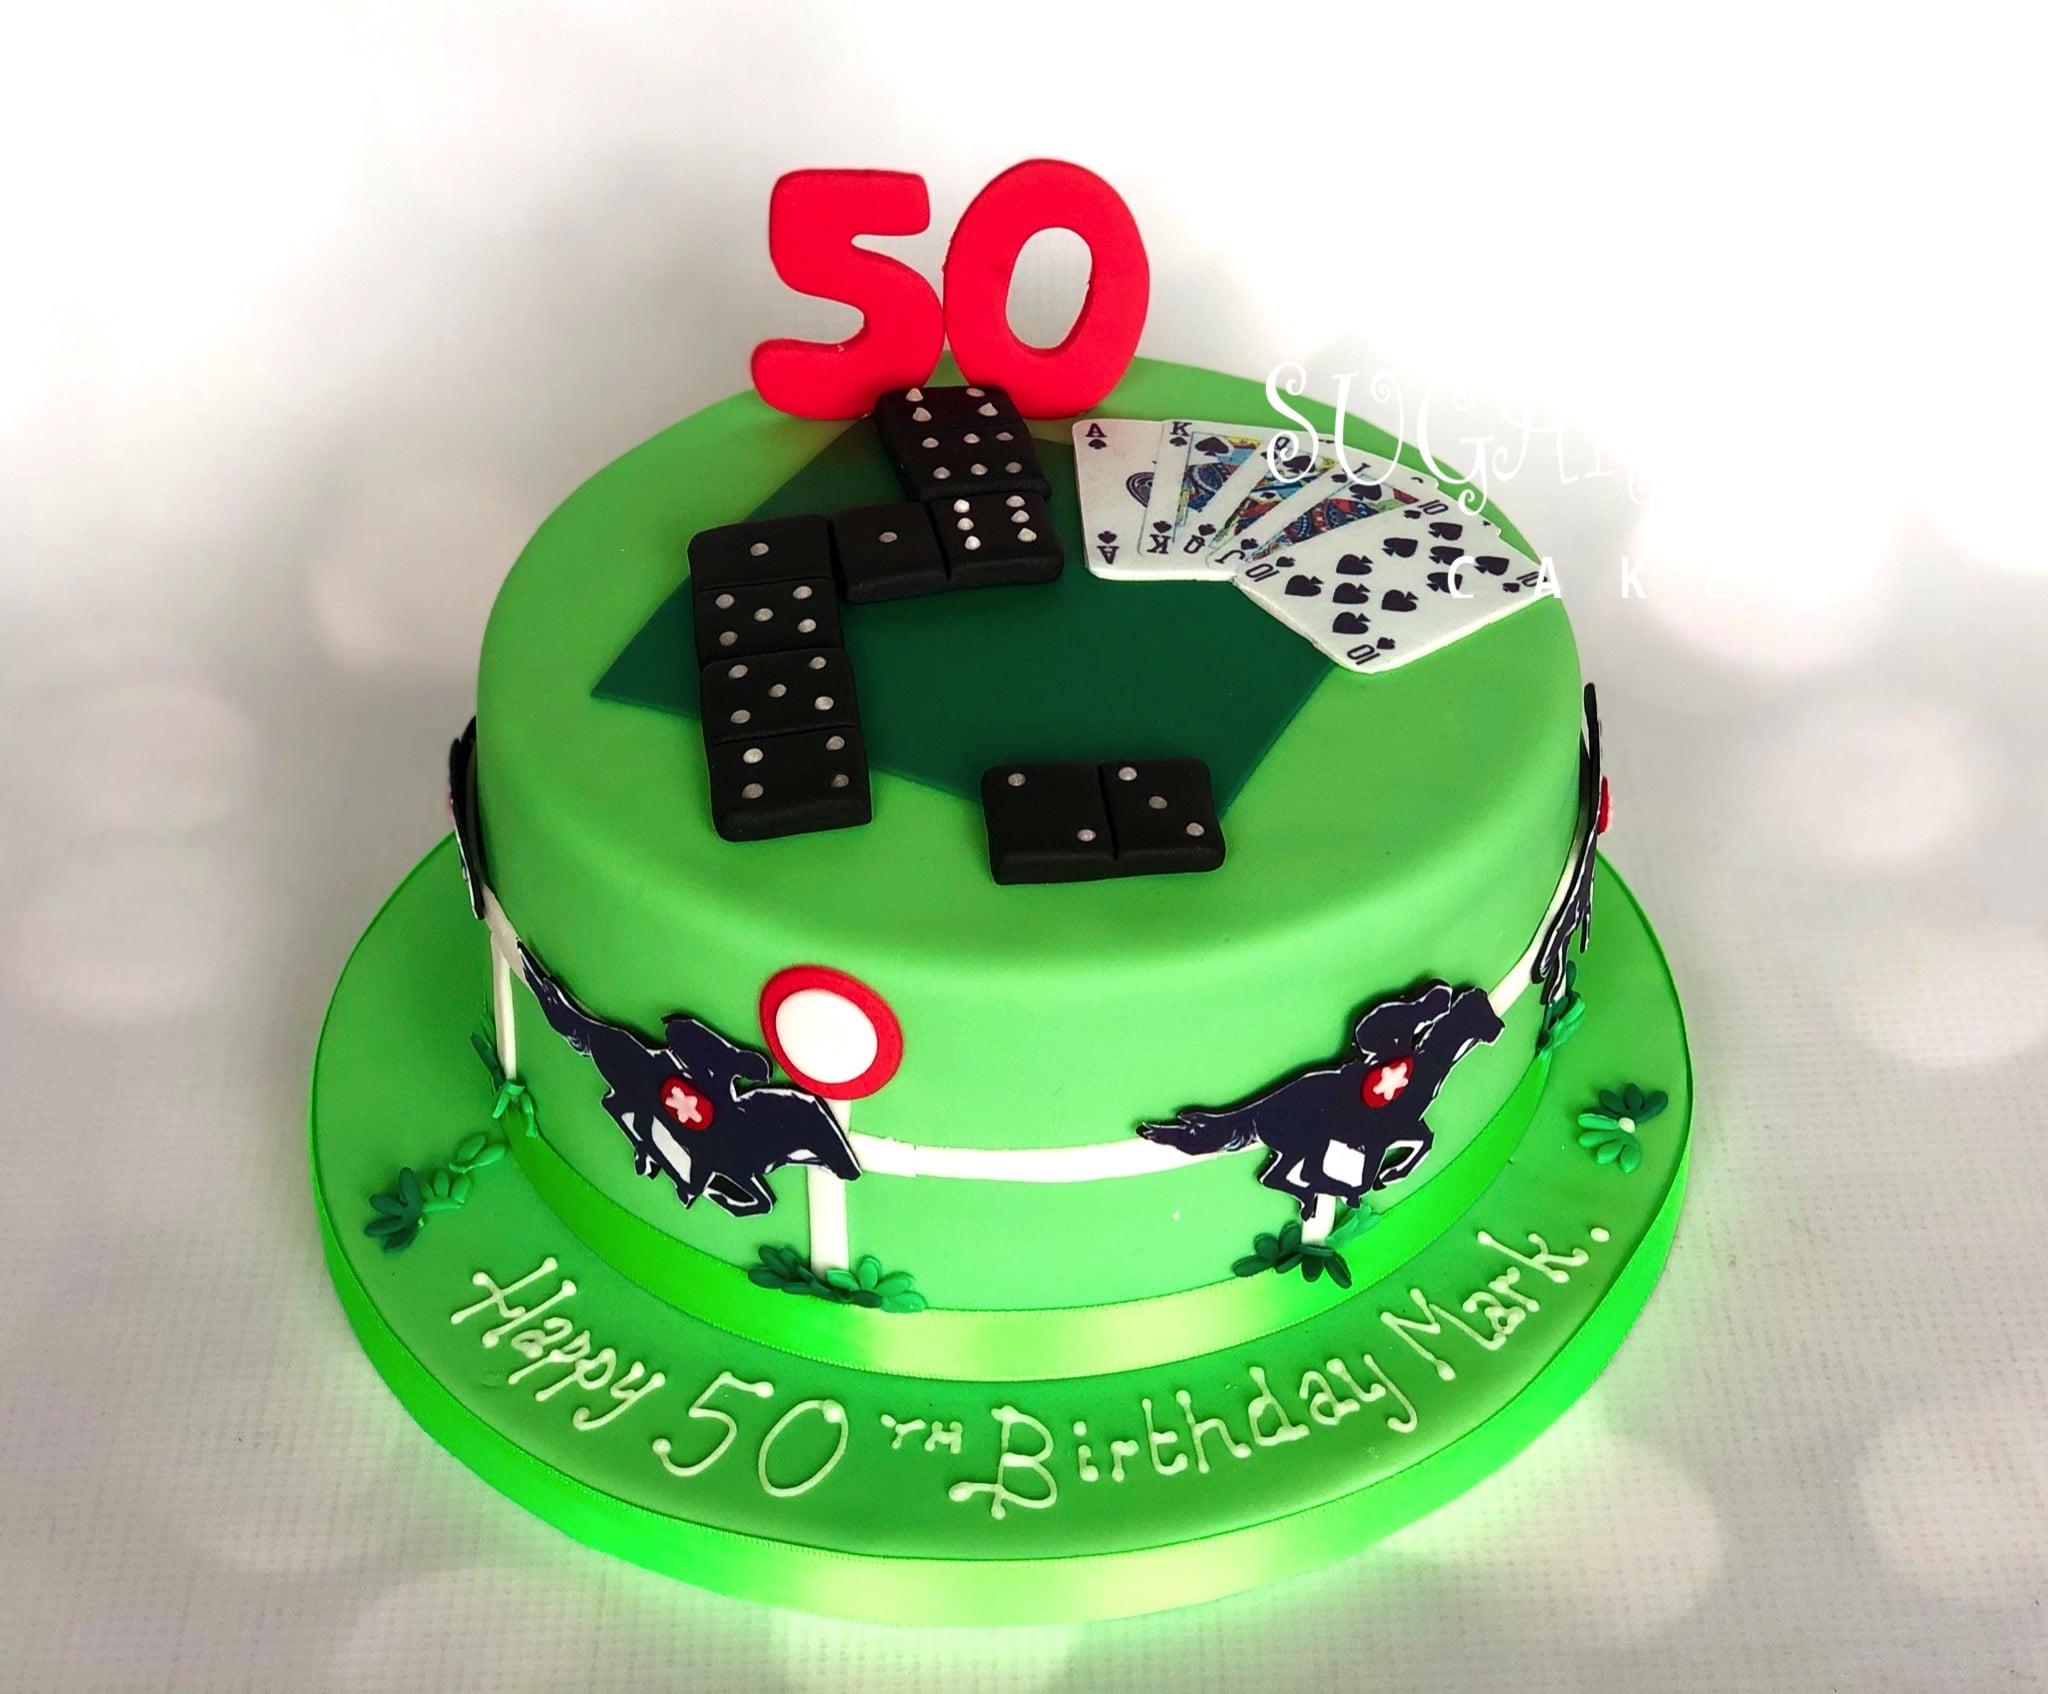 A Gambling Themed 50th Birthday Cake, Wistaston